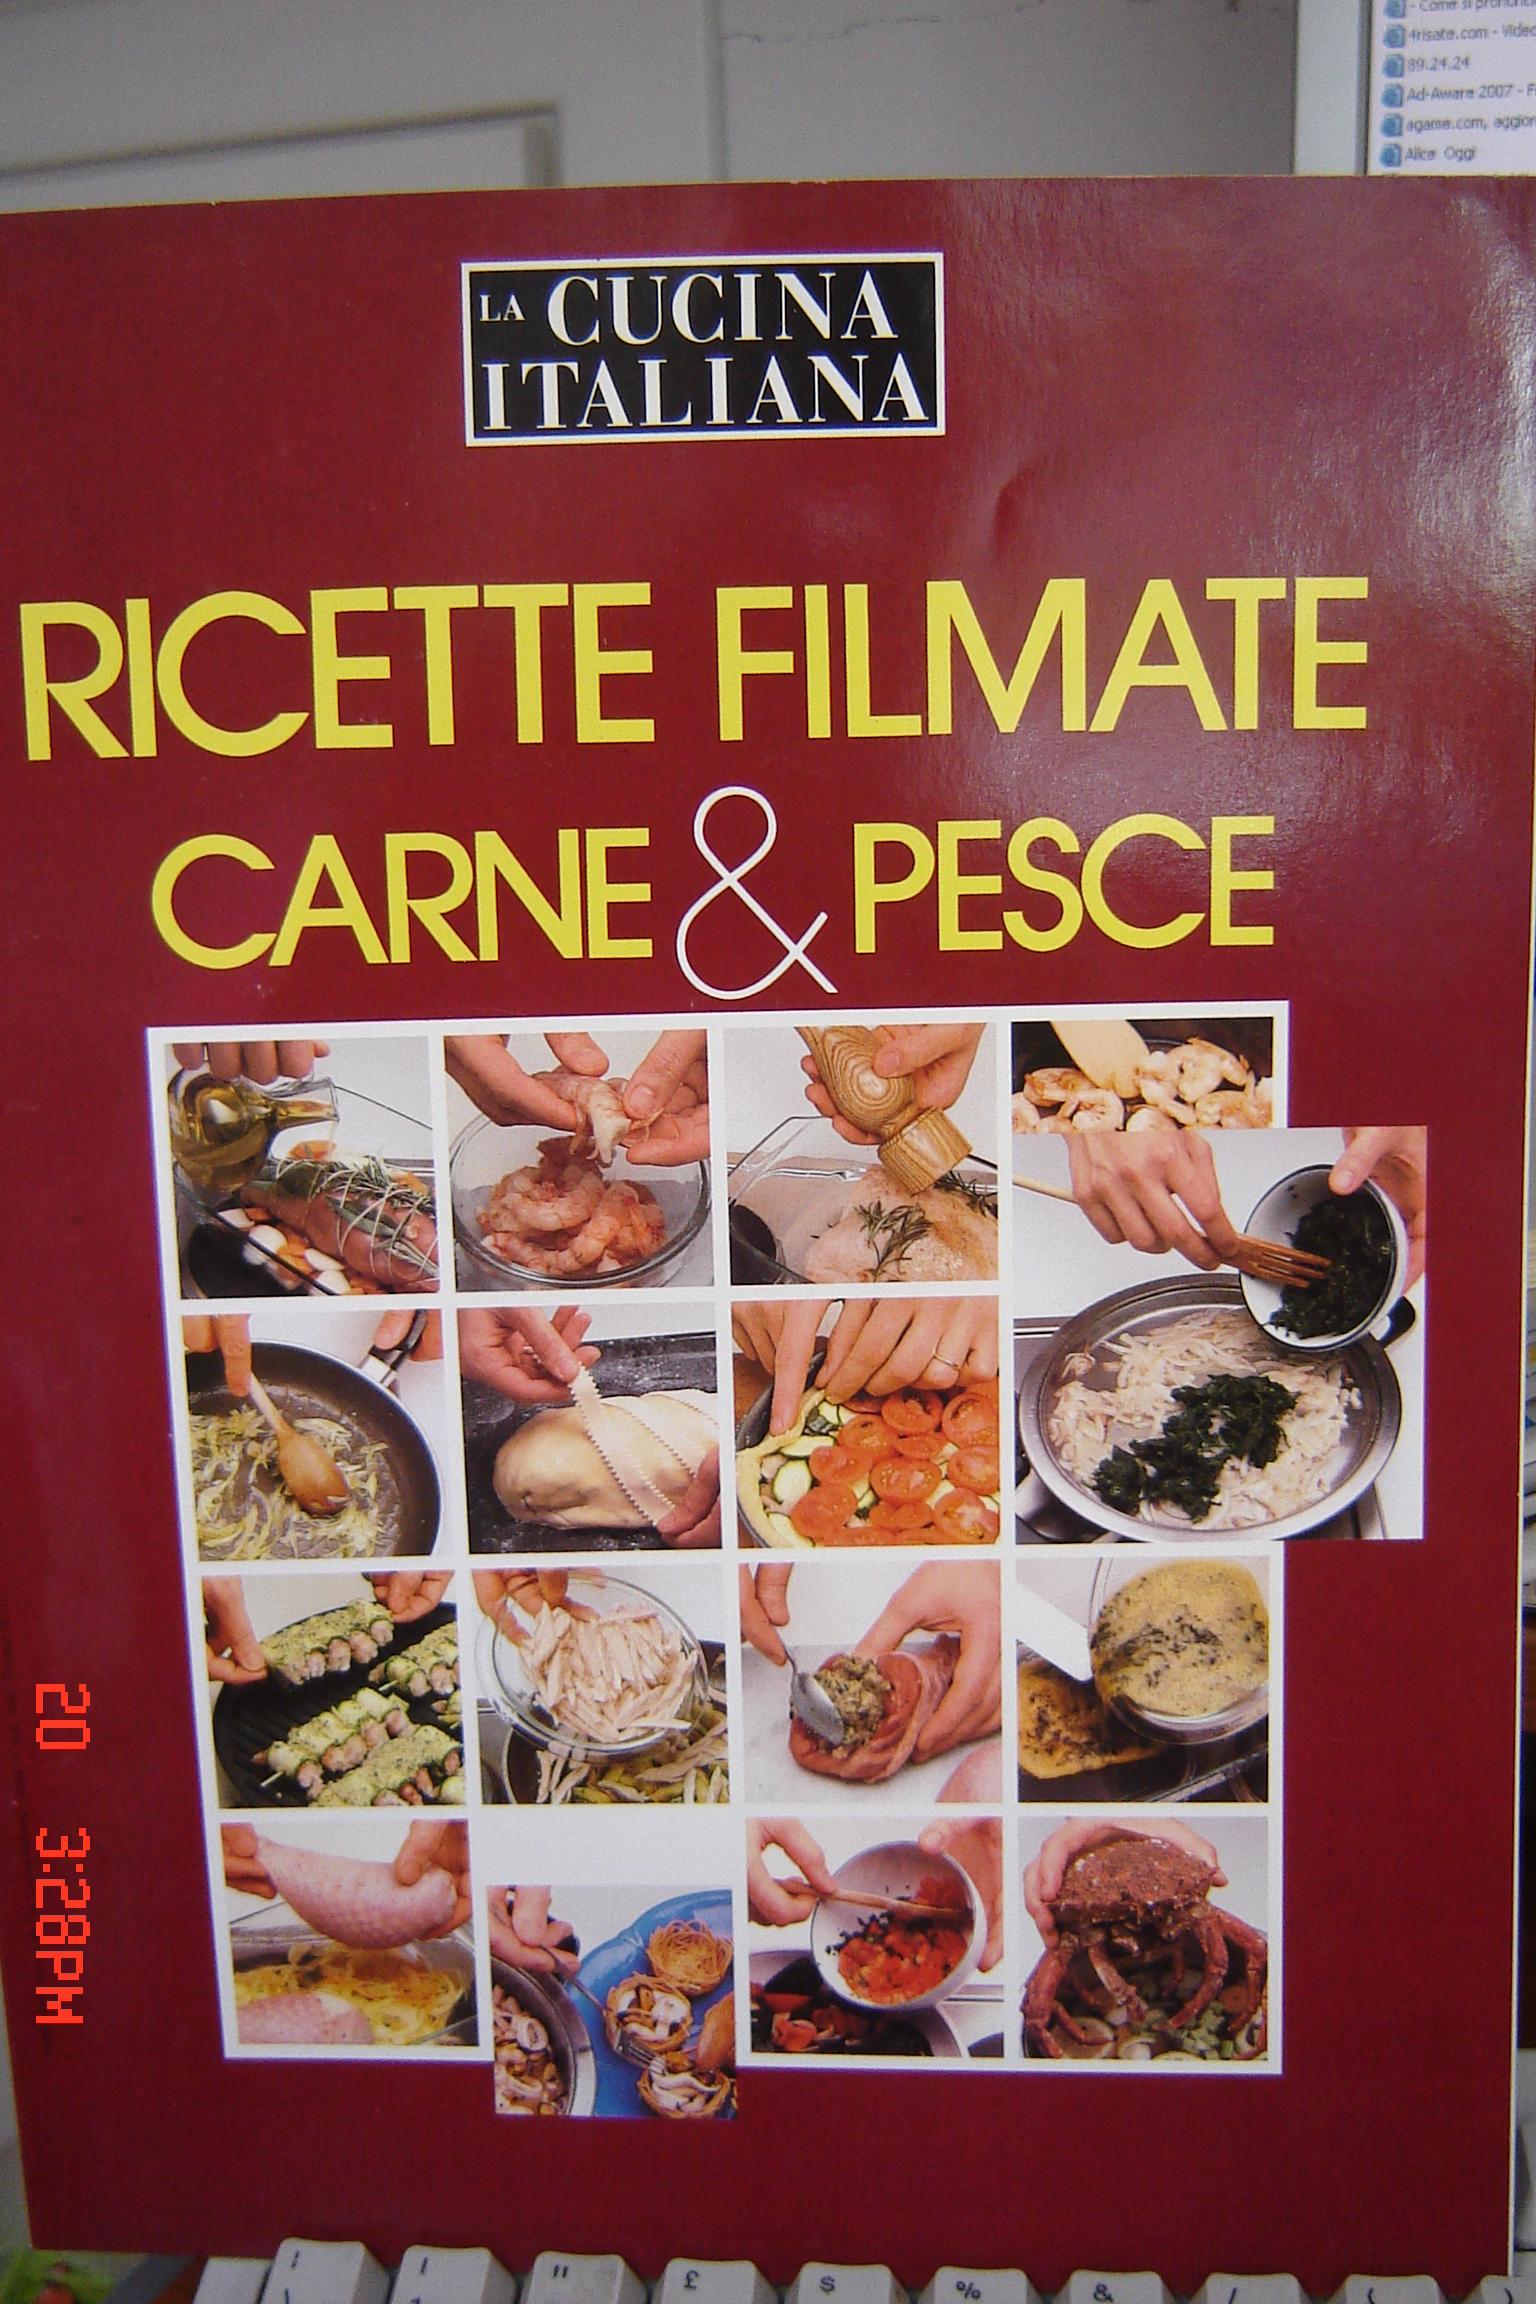 Ricette filmate carne & pesce